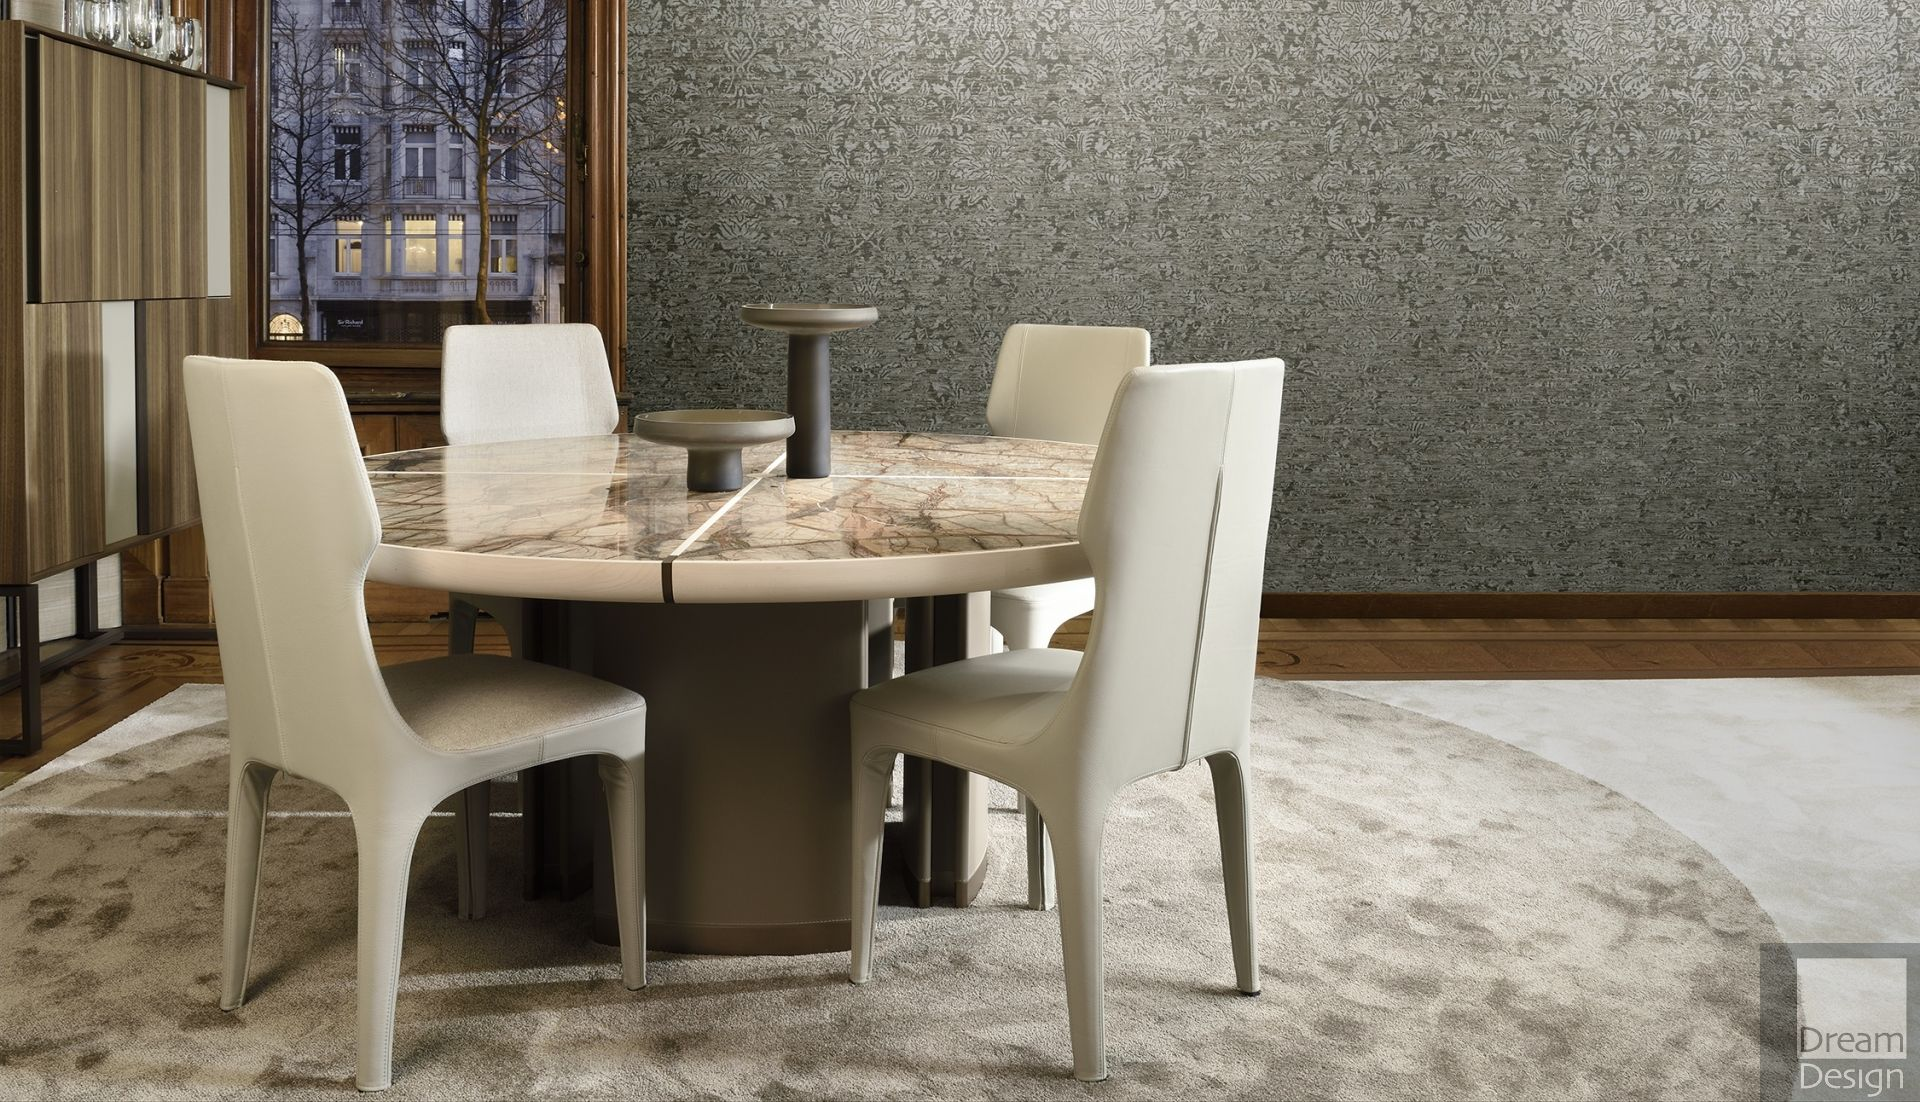 Tiche Chair Furniture design, Luxury furniture